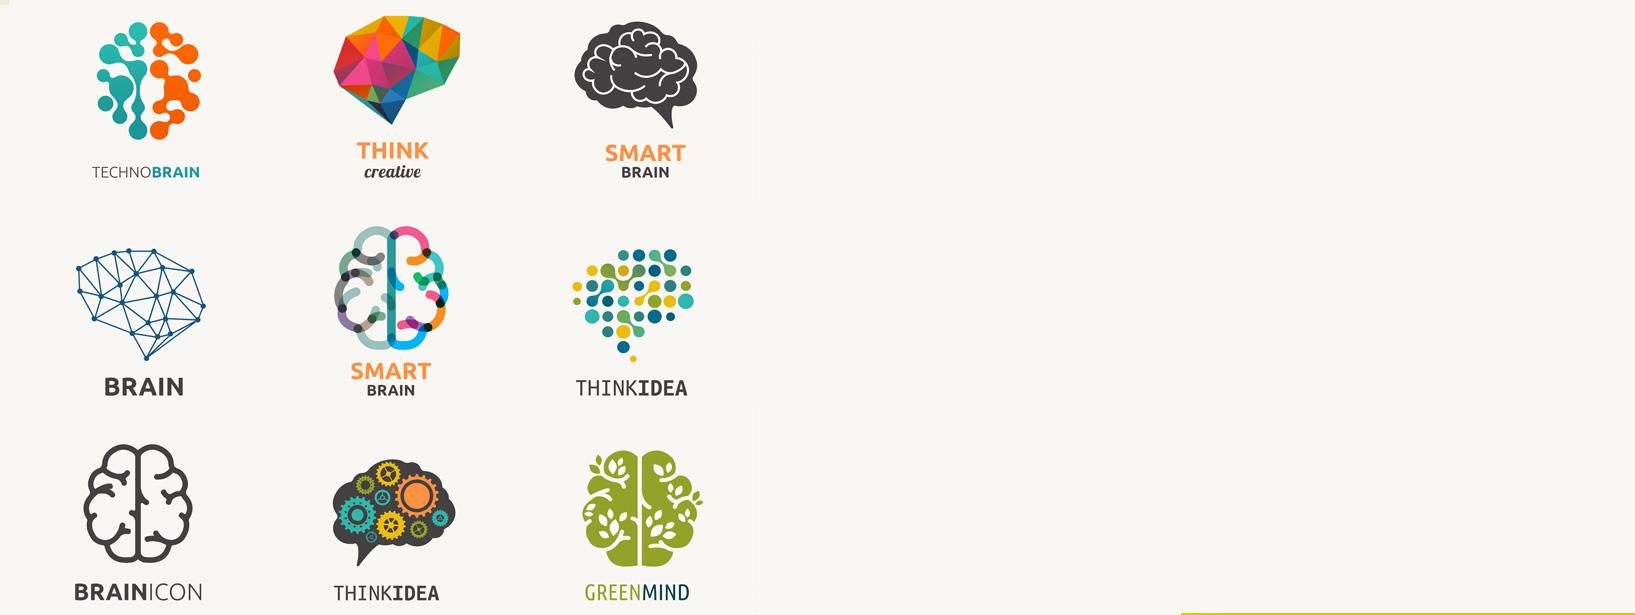 Pensamos diferente, brainstorming sin limites